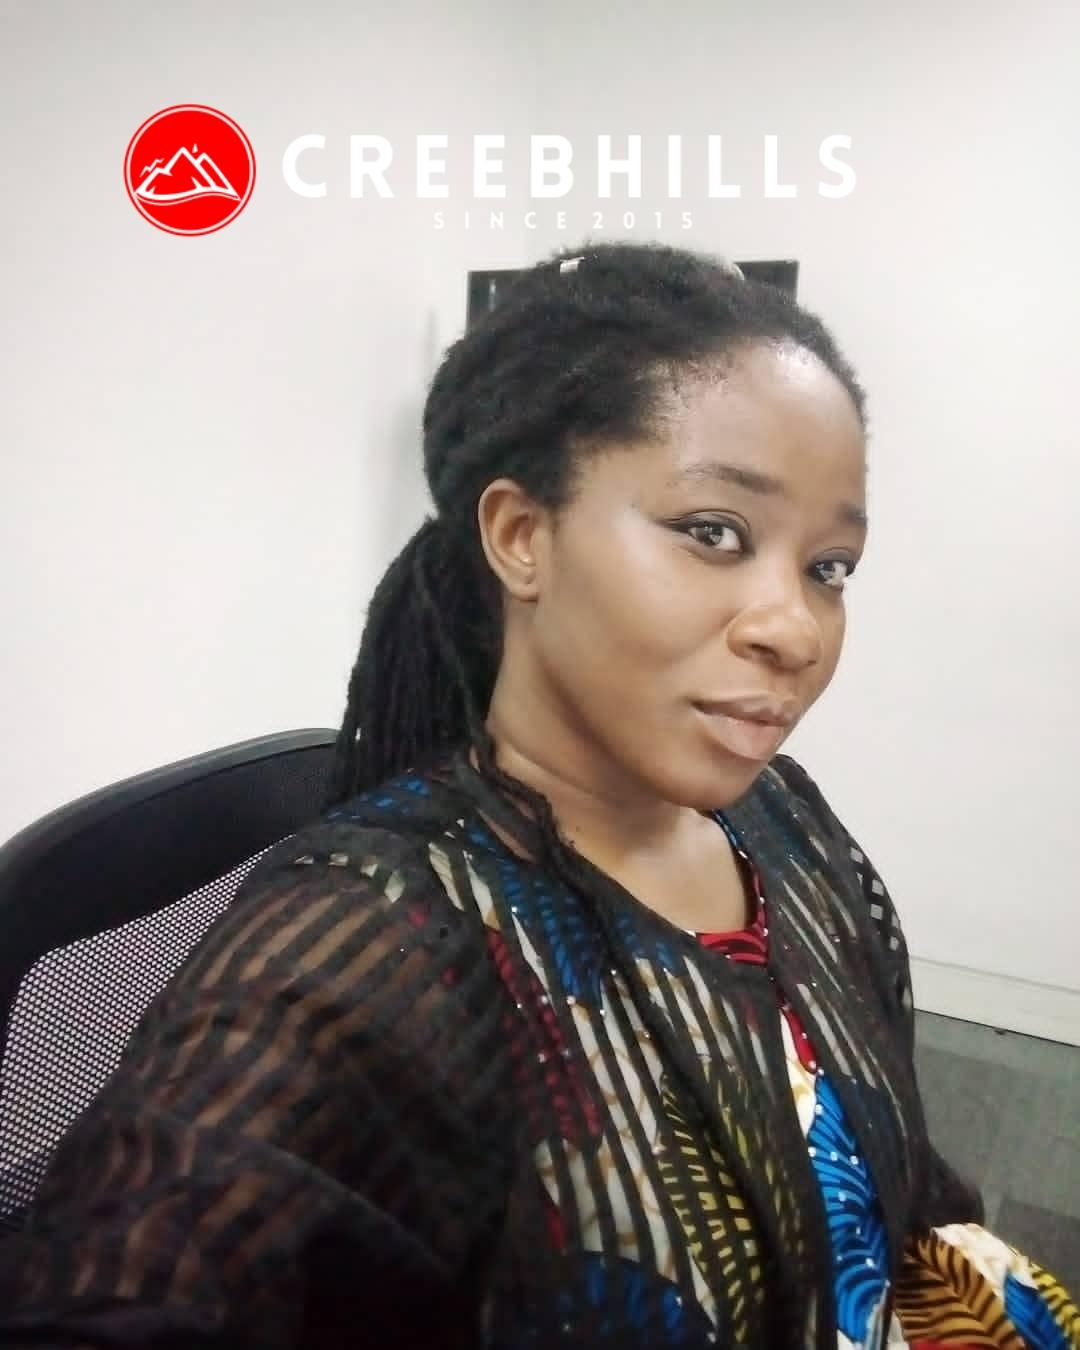 #SexForGrade journalist Oge Obi attempts suicide, accuses Kiki Mordi of alleged intellectual theft